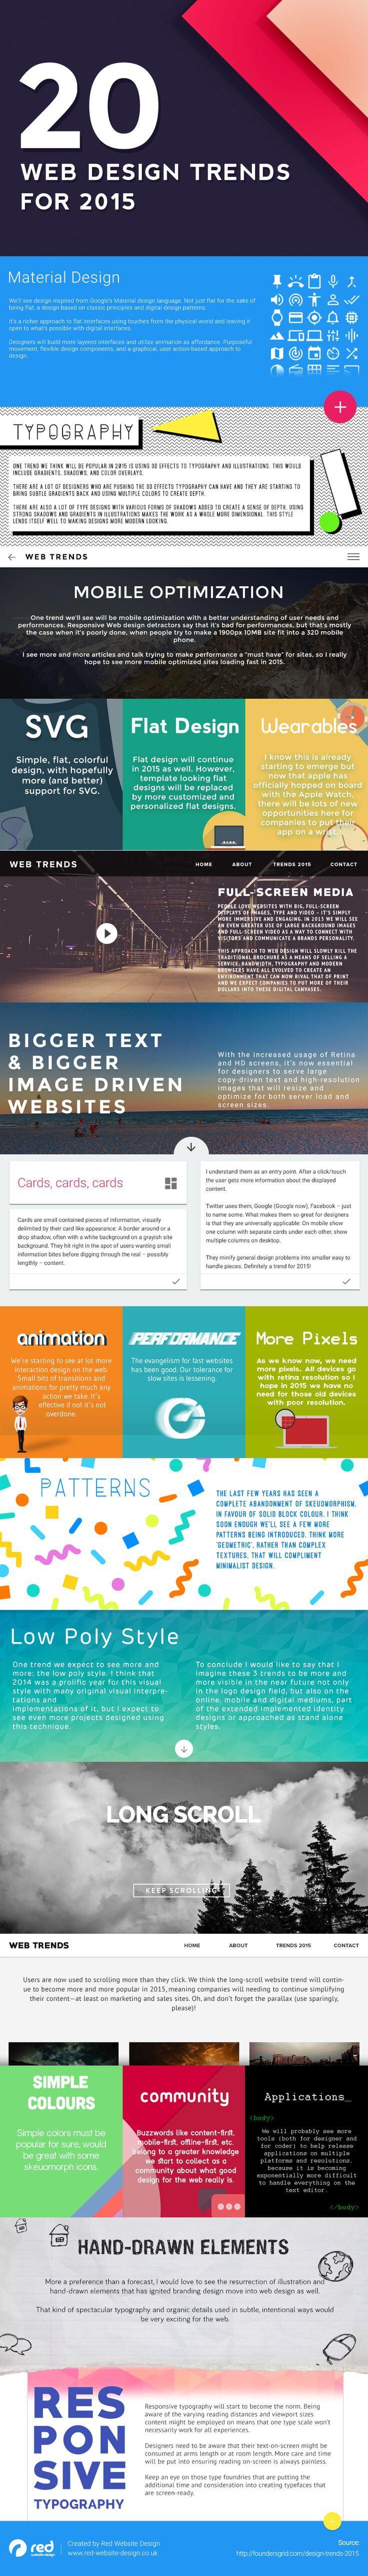 tendances-webdesign-2015-infographie